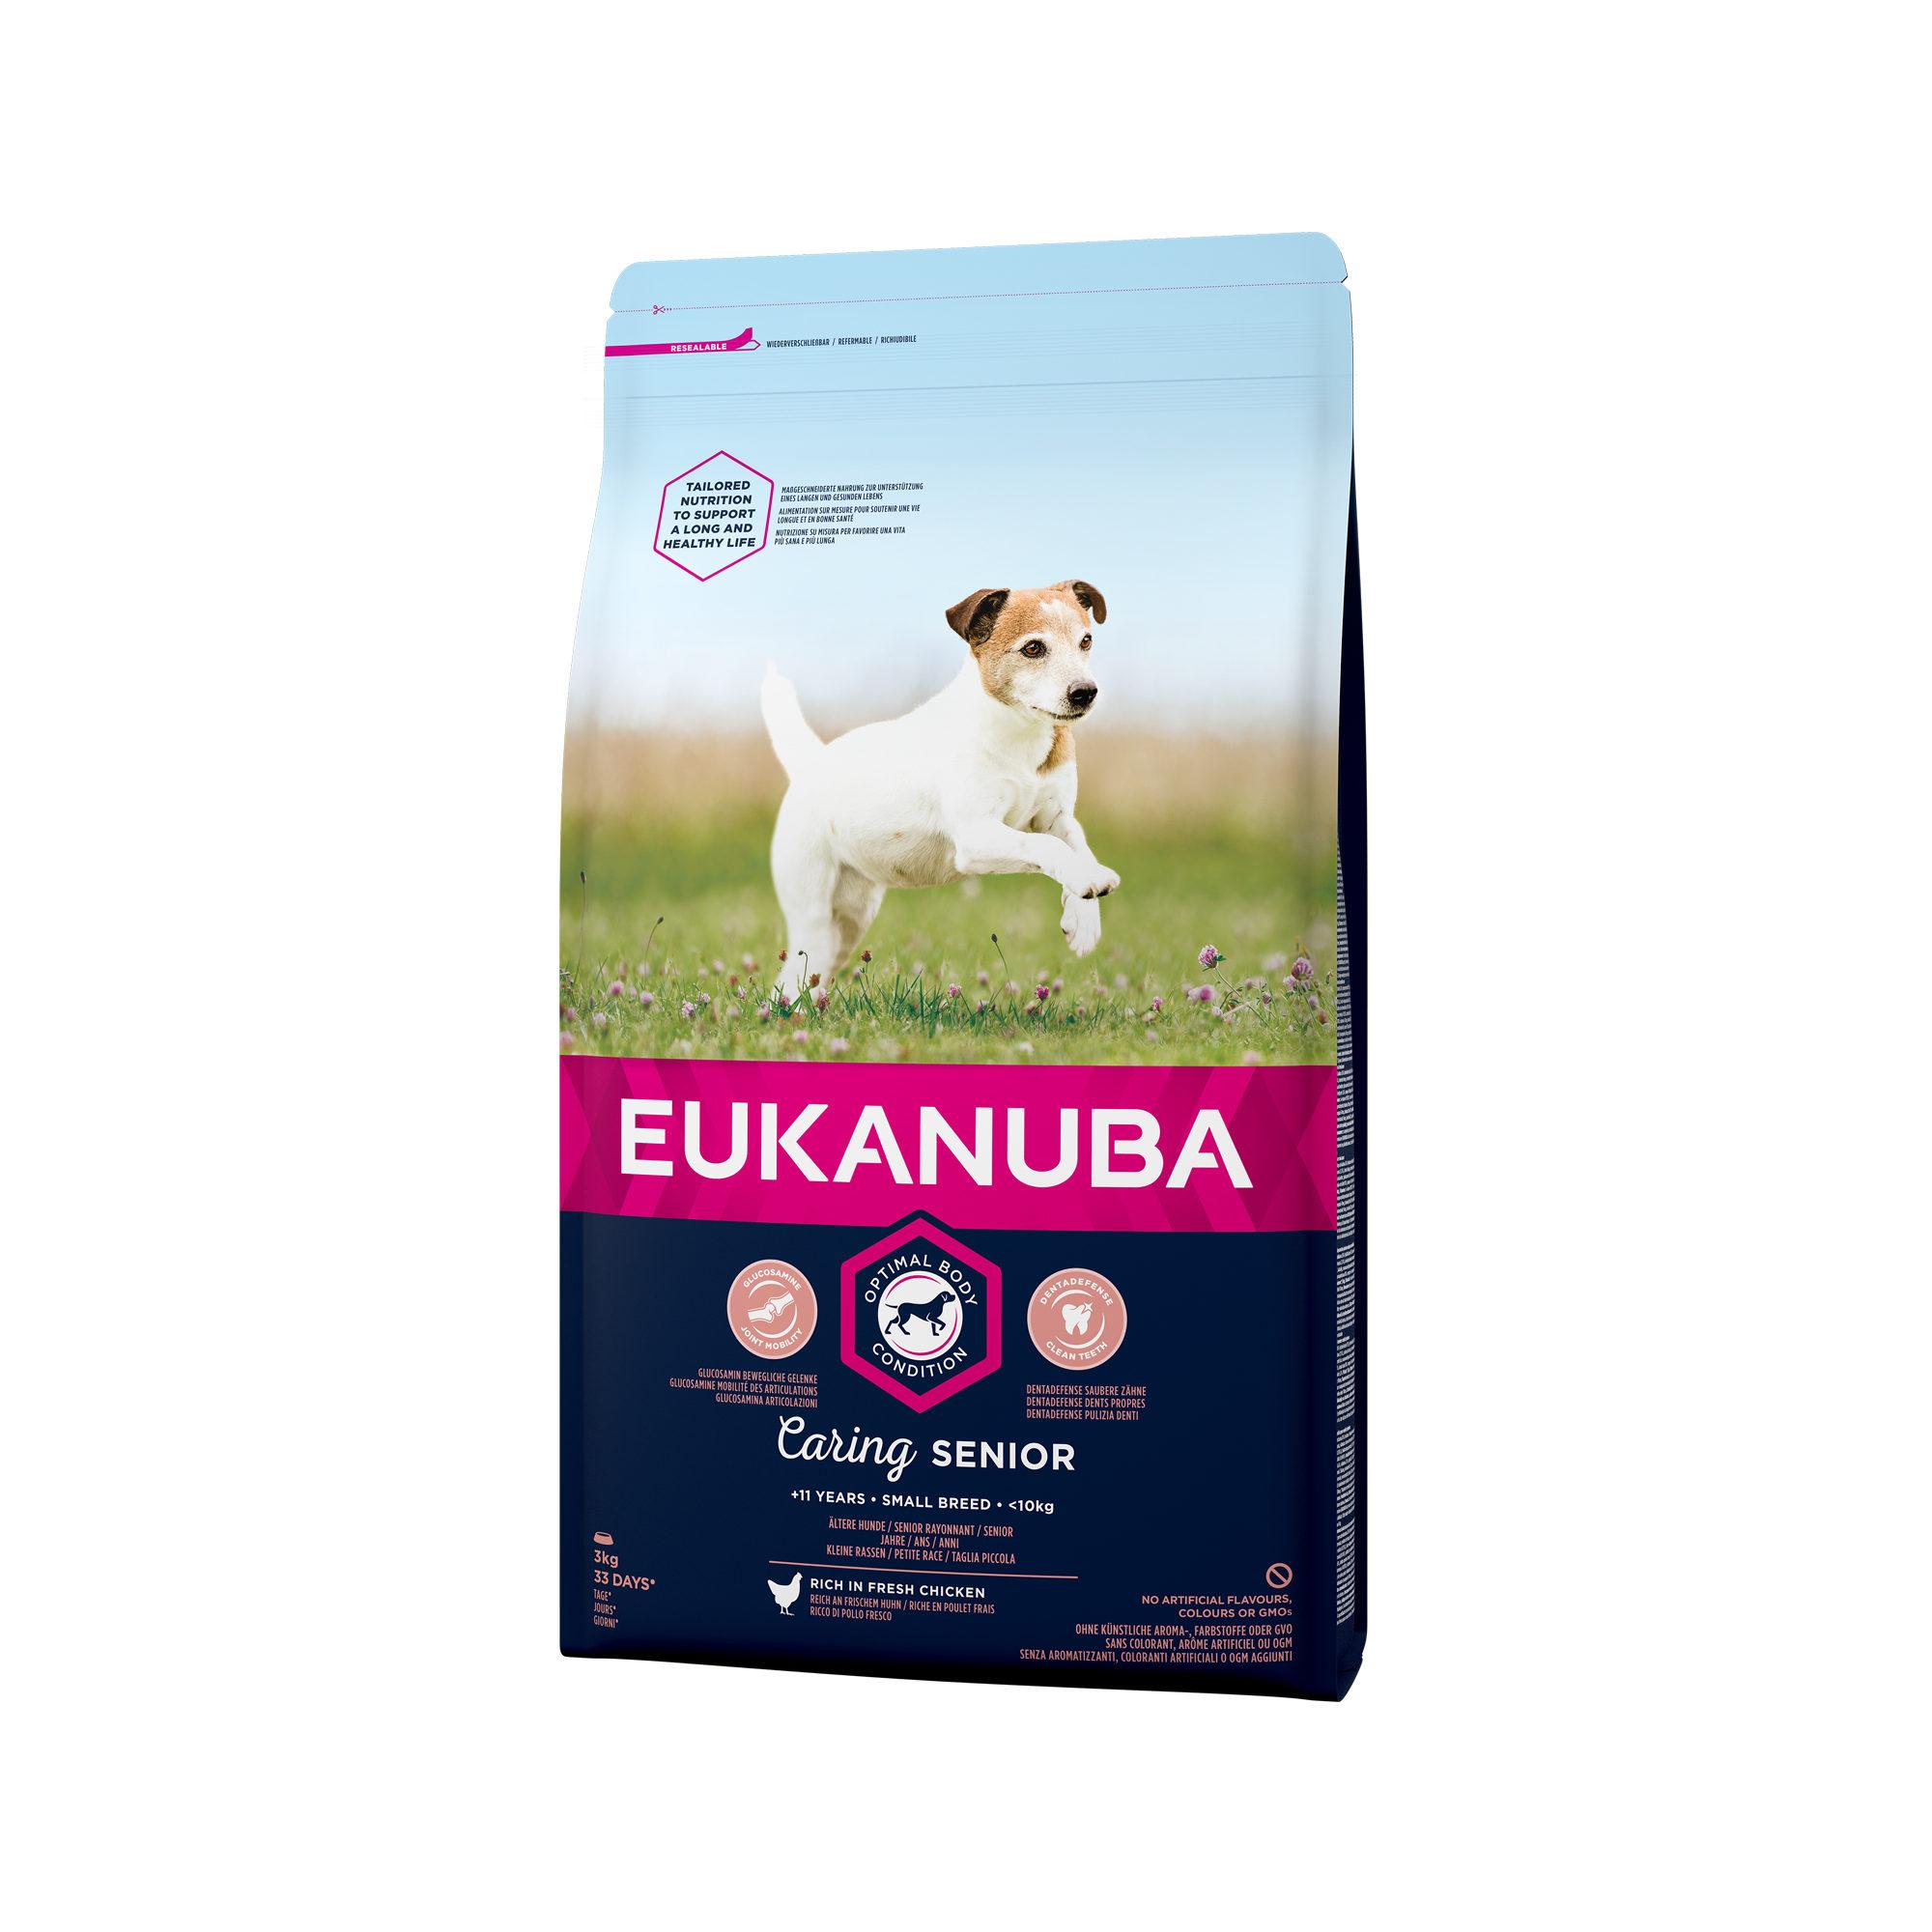 Eukanuba Caring Senior Small Breed Hundefutter